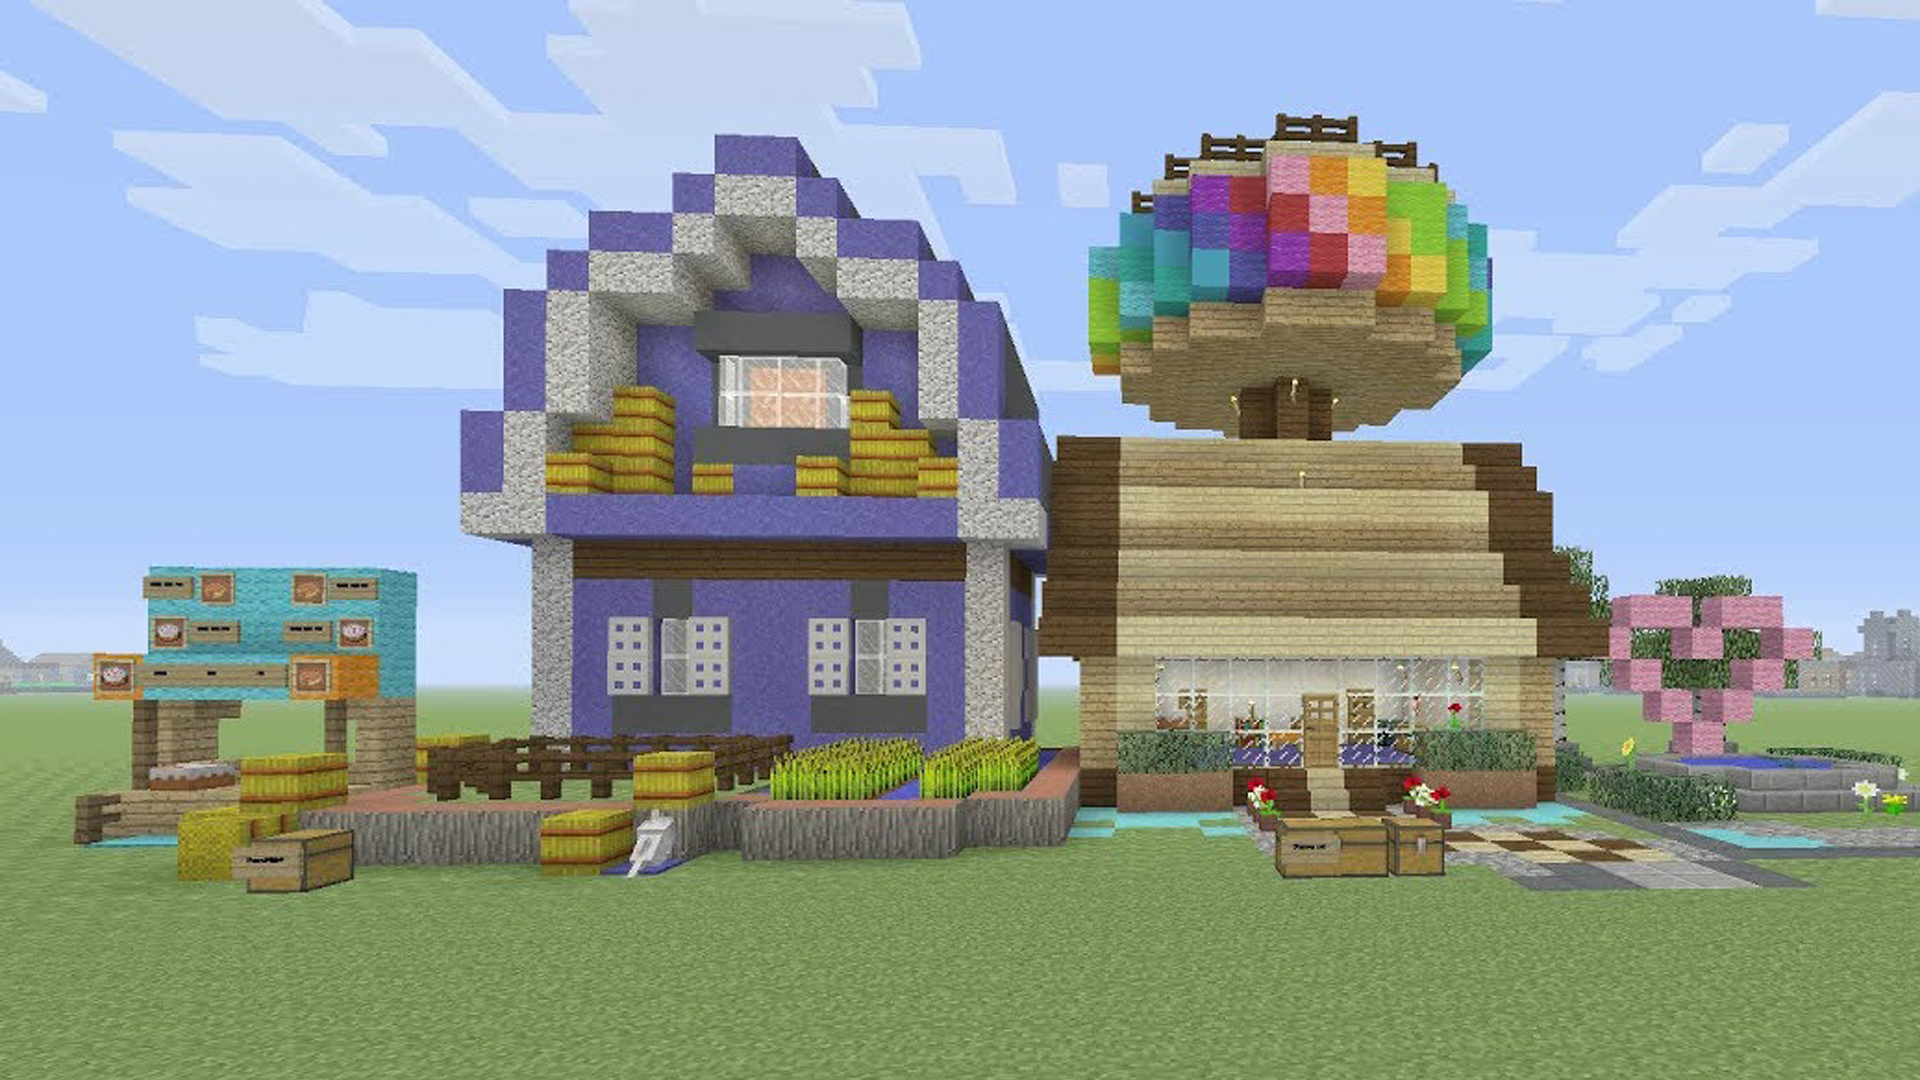 minecraft houses tutorial step by step